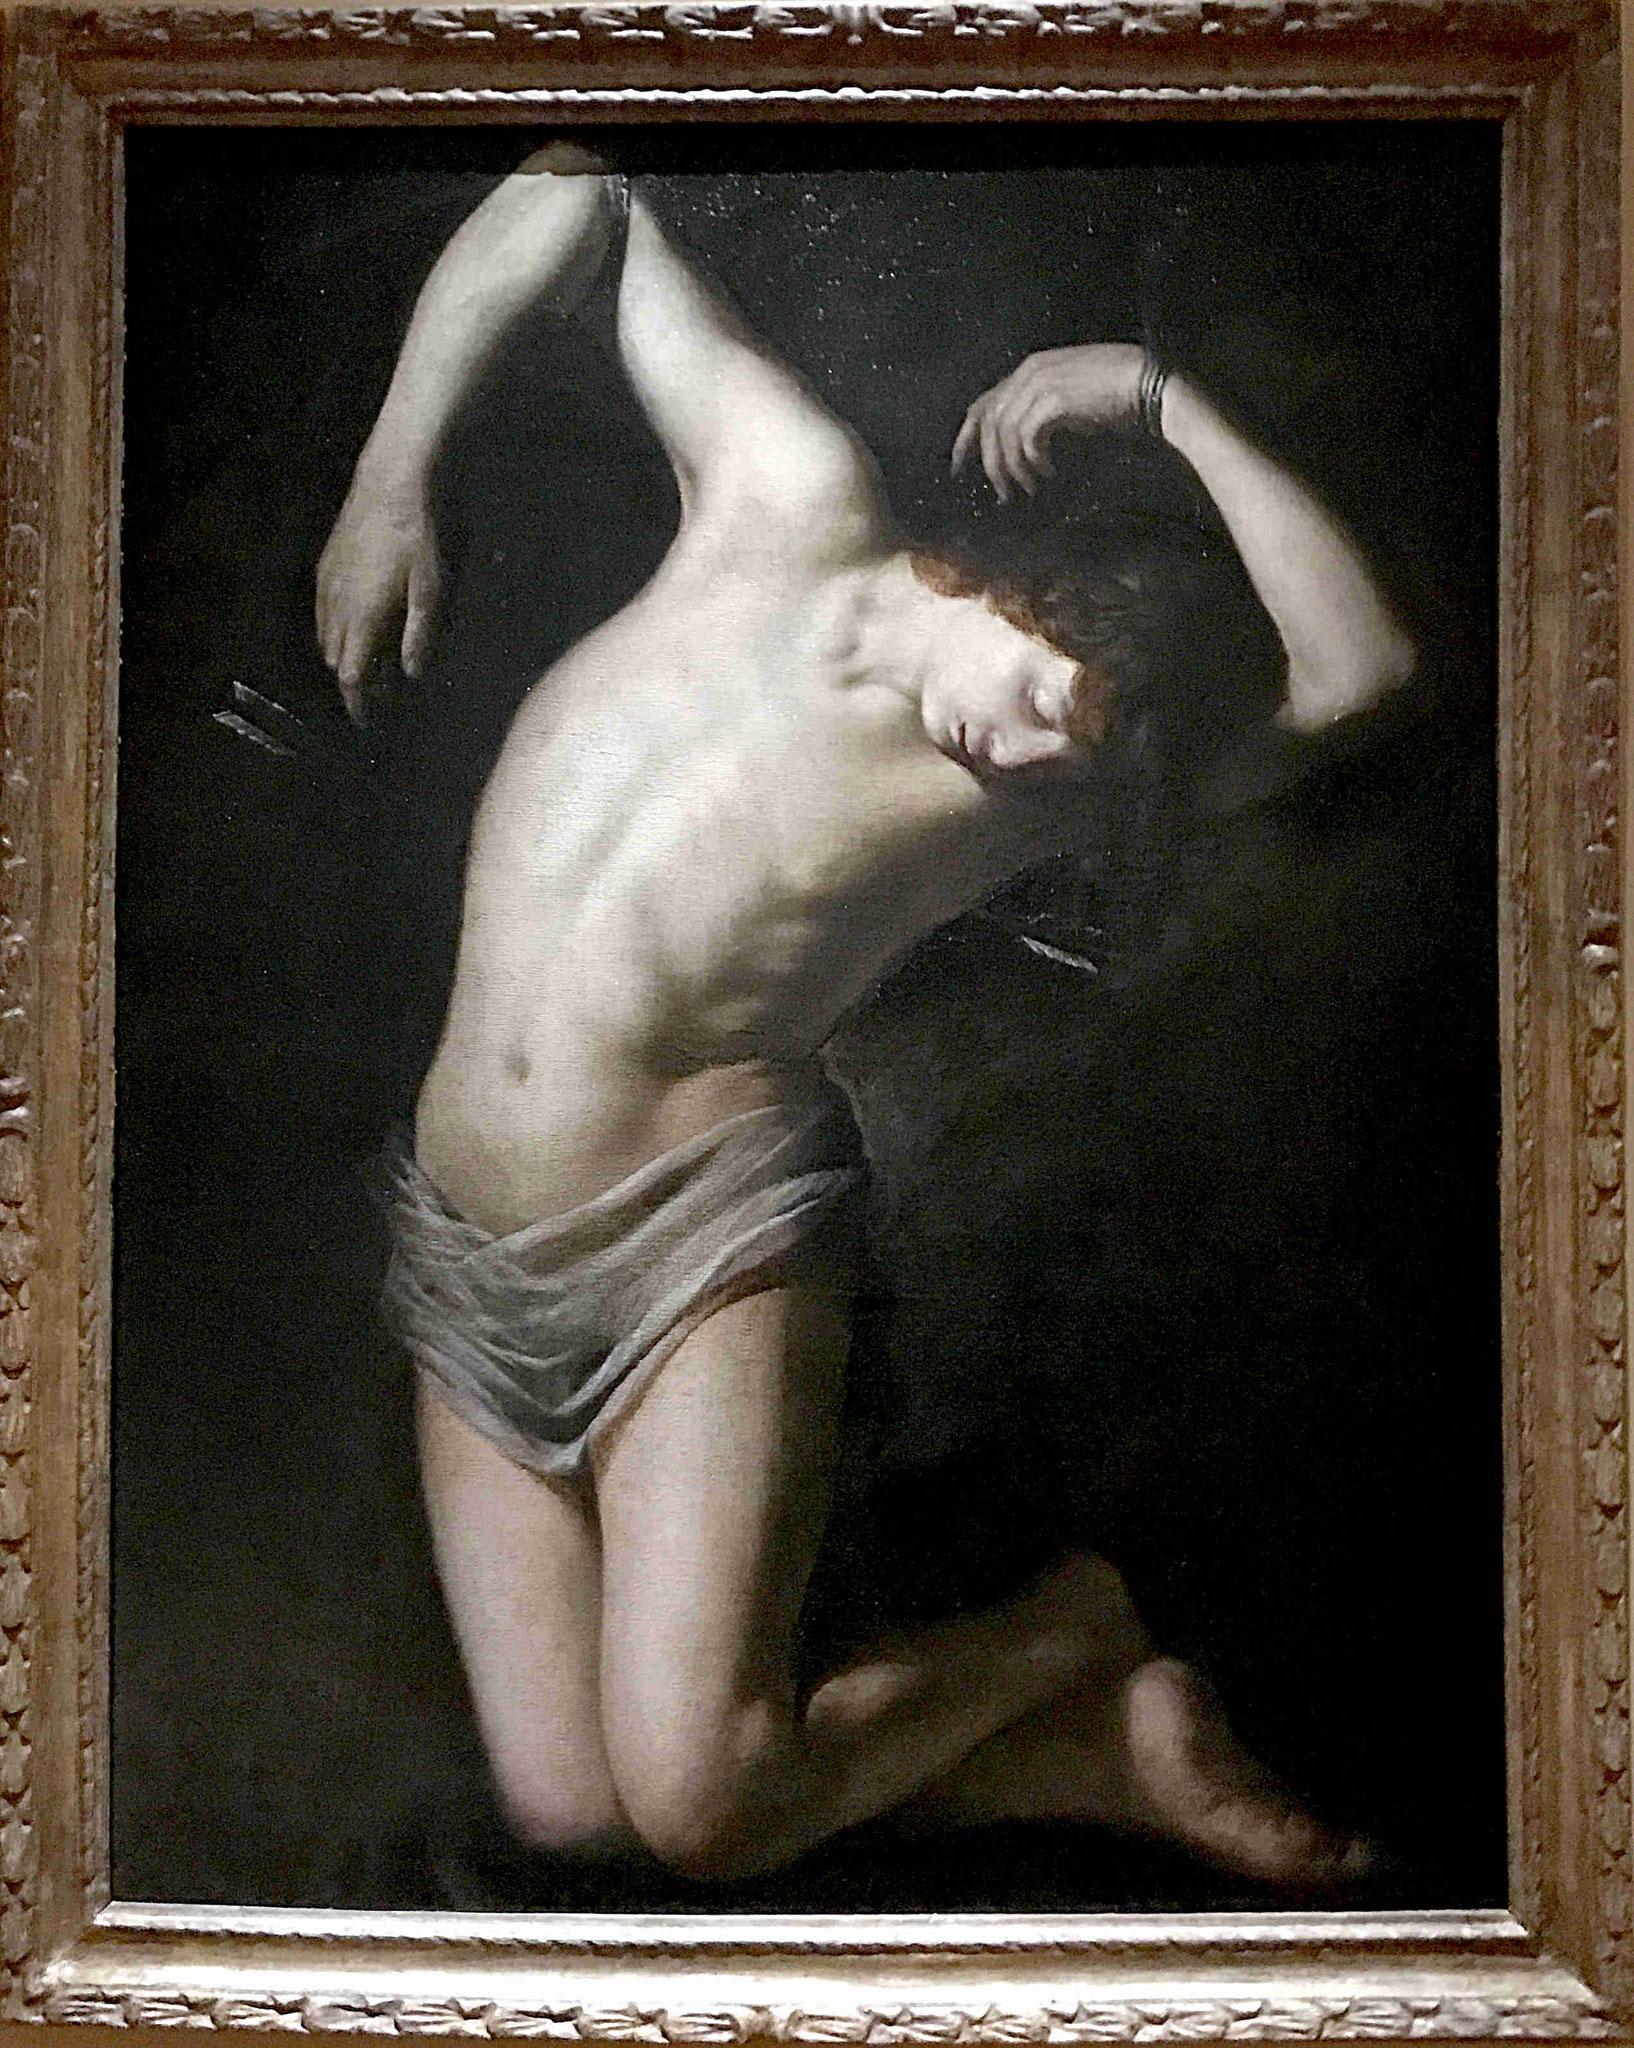 Spadarino, Martyre de Saint Sébastien, vers 1650 /MUDO